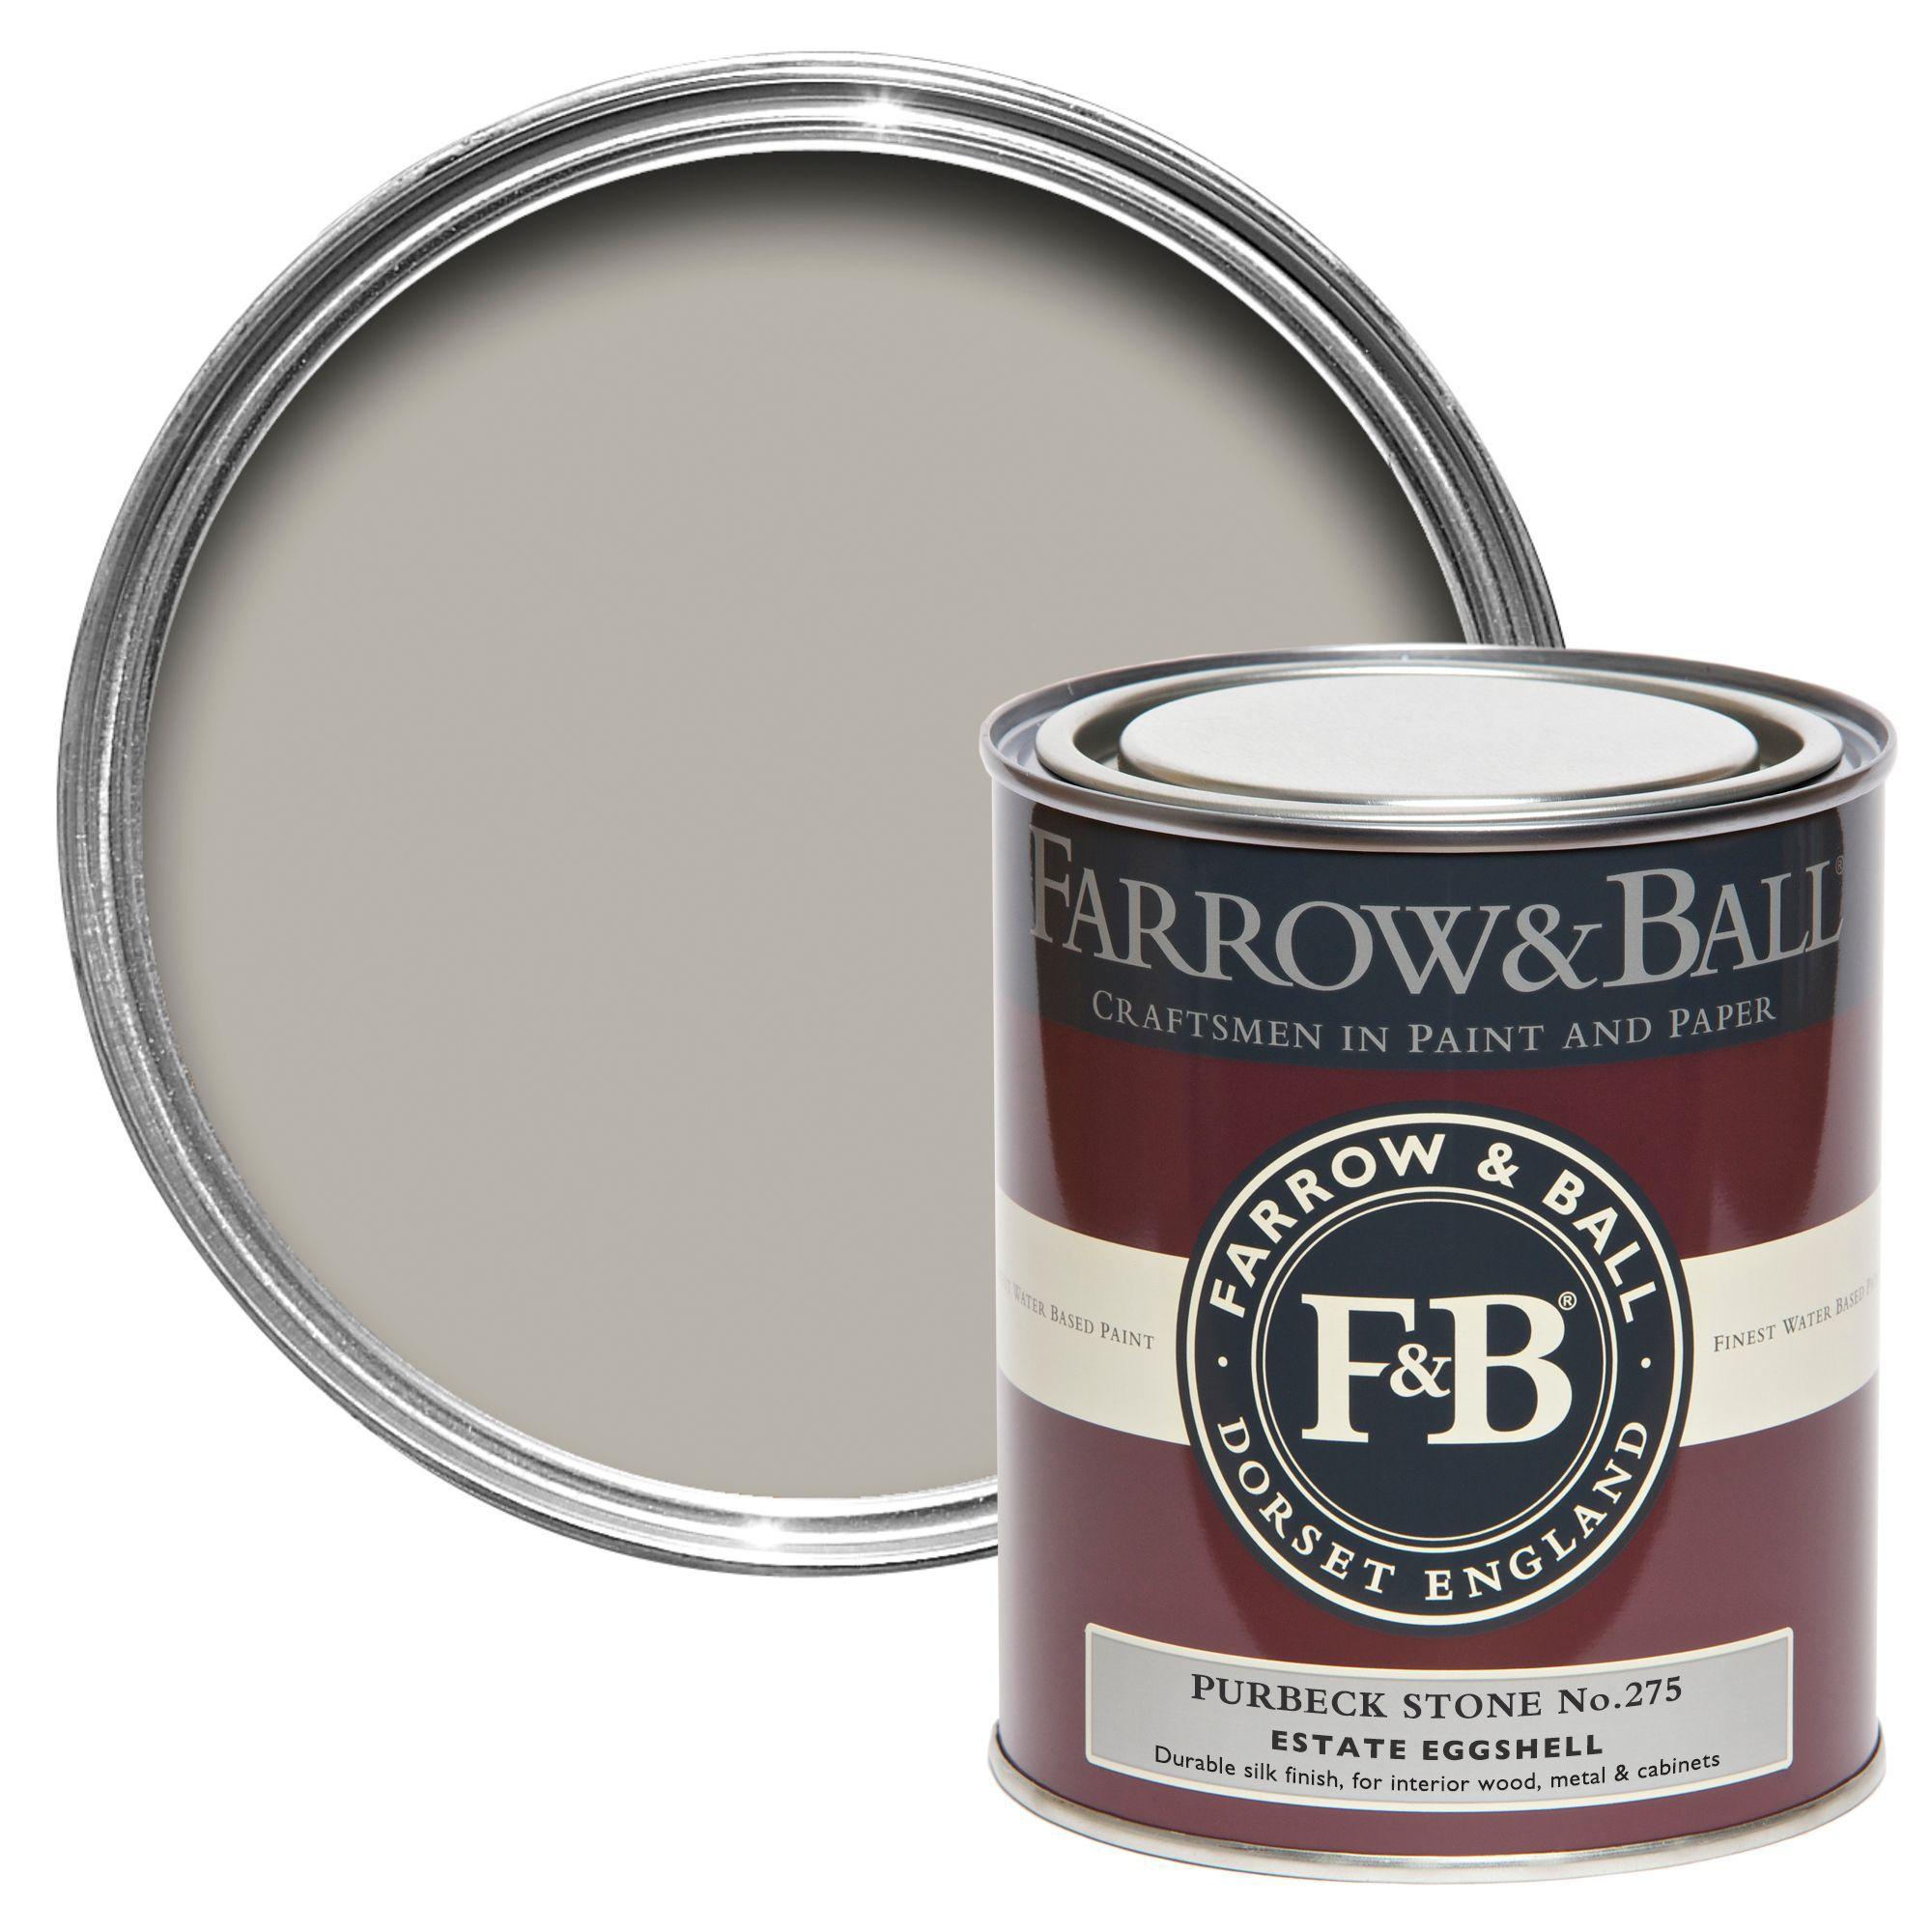 Farrow Ball Purbeck Stone No275 Estate Eggshell Paint 750 Ml